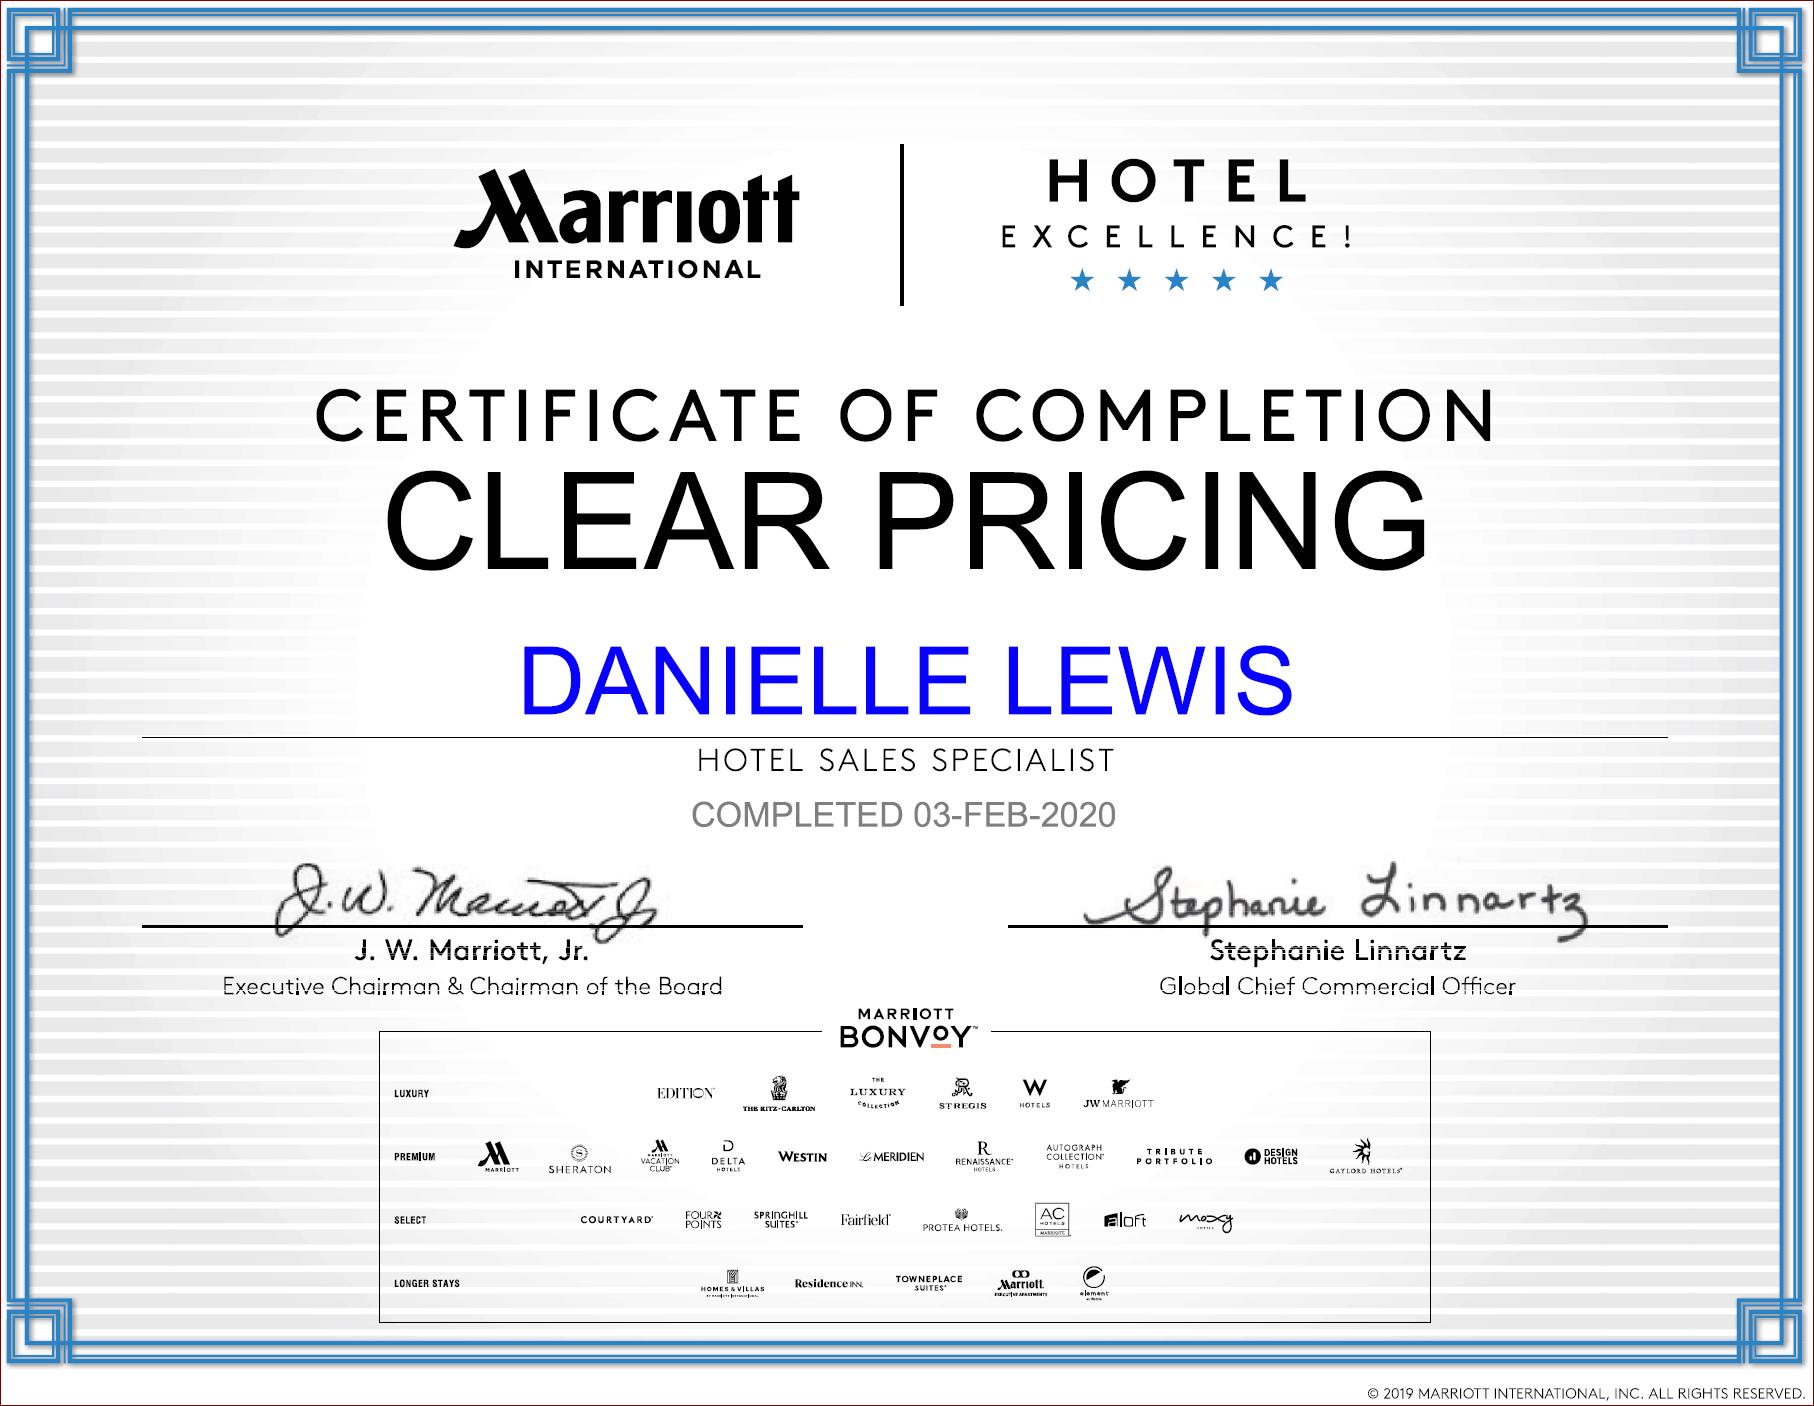 SelfishMe Travel - Marriott International Clear Pricing Certificate